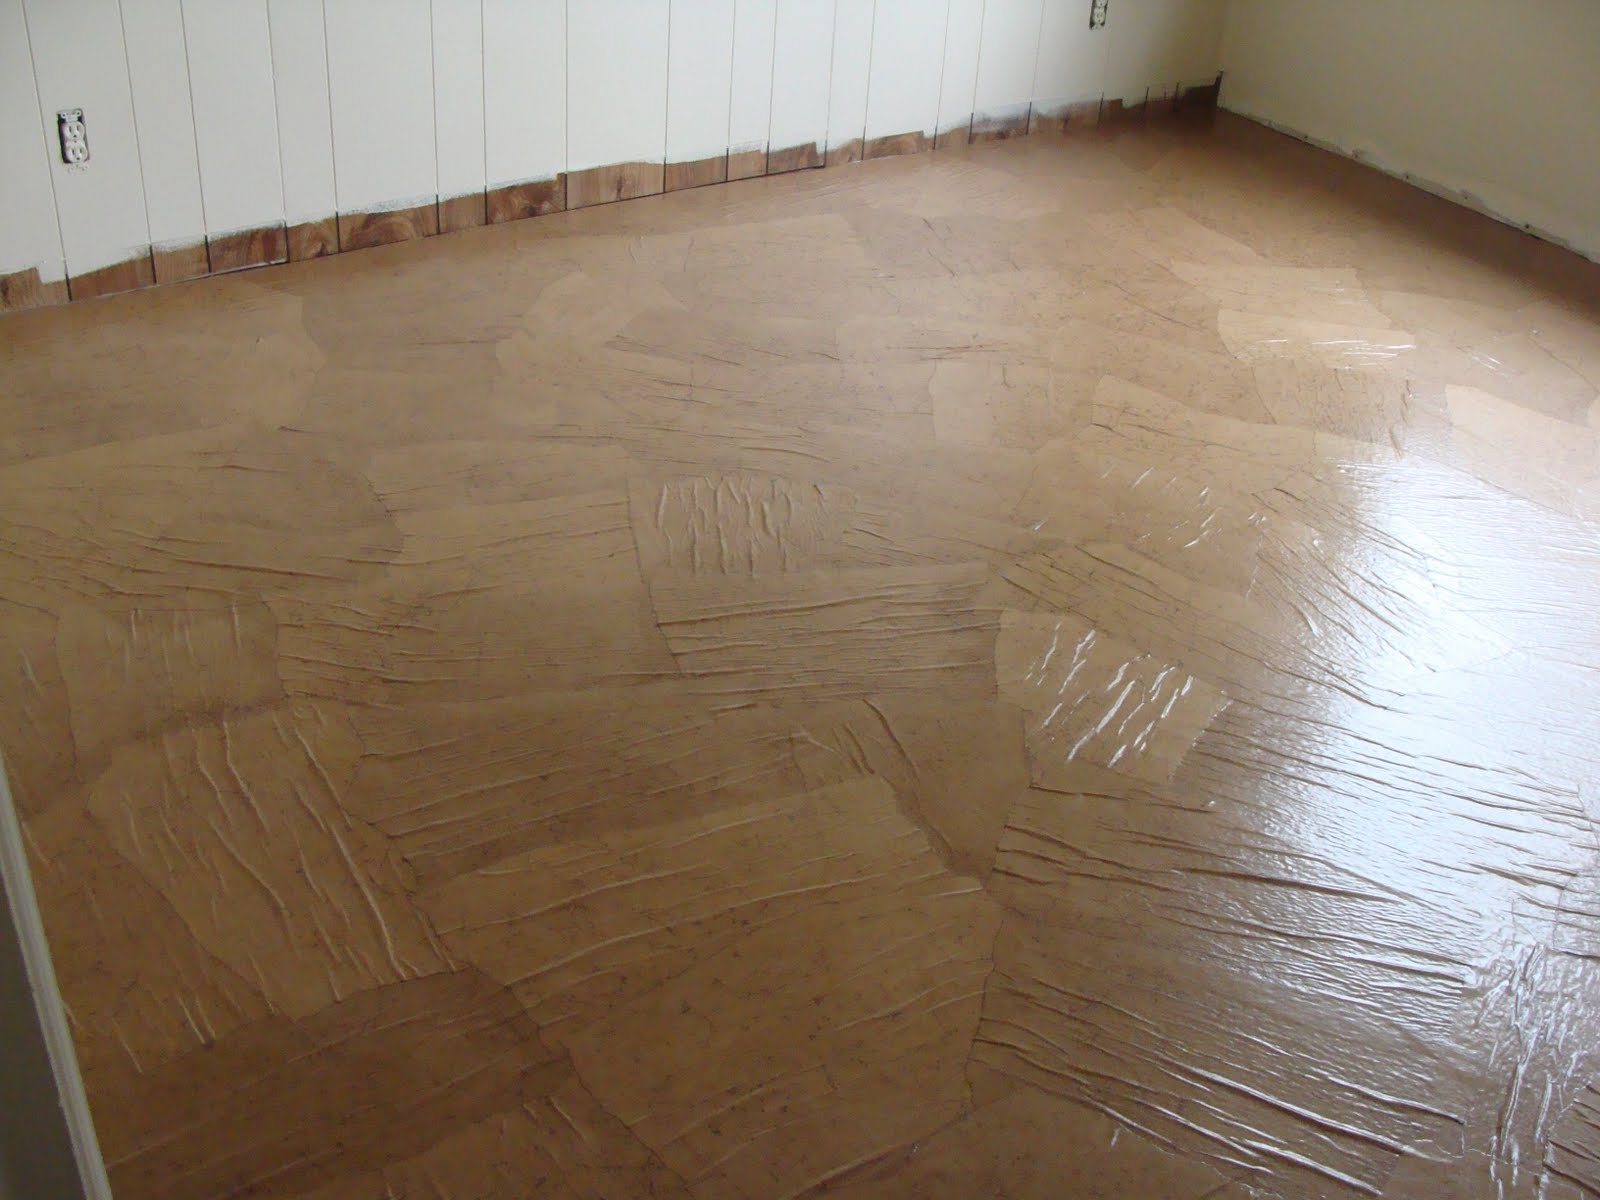 The Floor Failure Not An Oregon Cottage